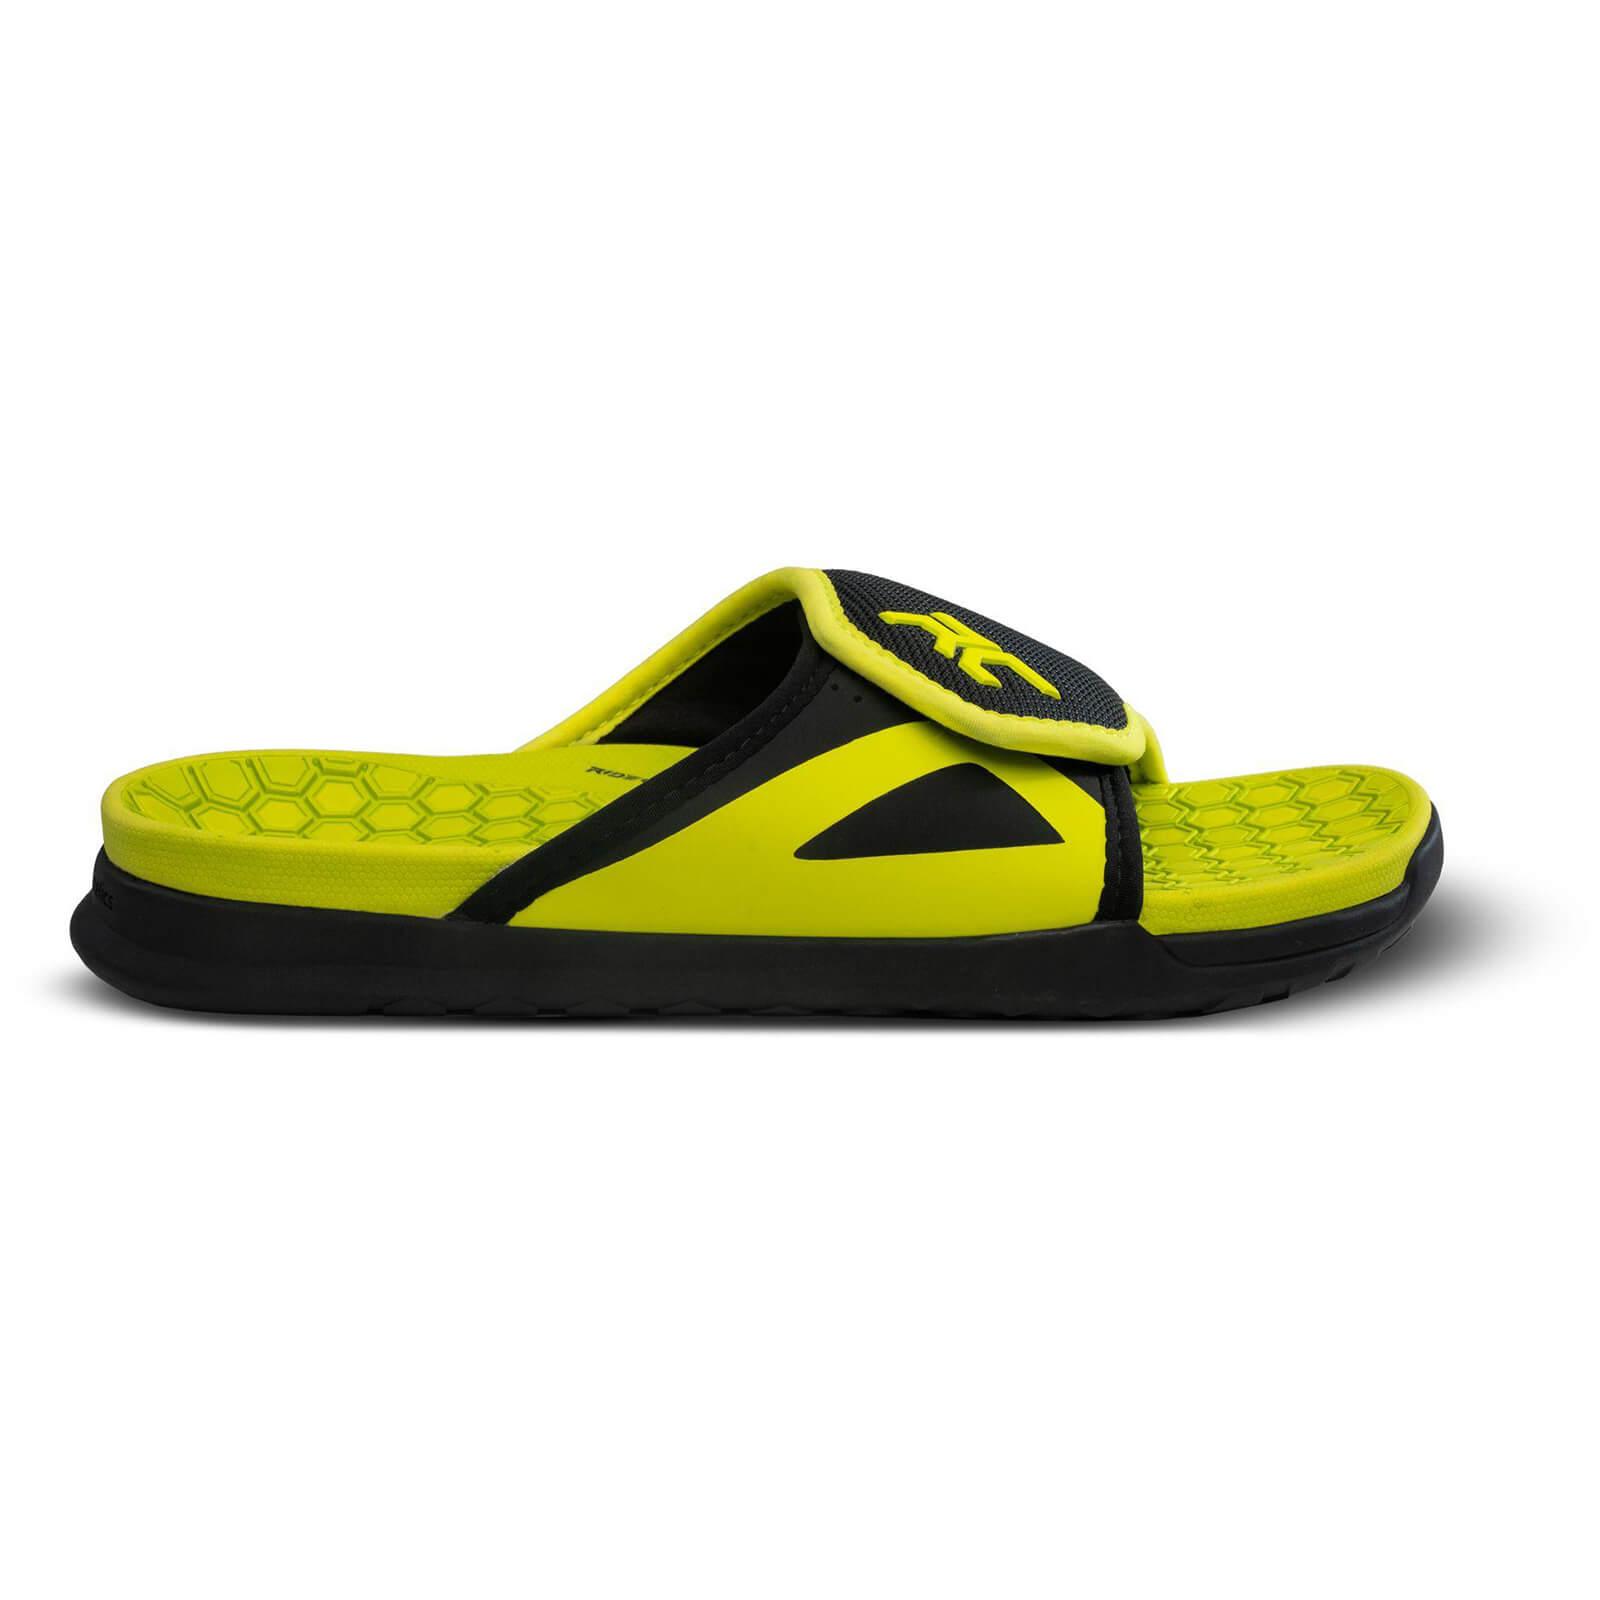 Ride Concepts Coaster Youth Shoes - UK 3.5/EU 36.5 - Black/Lime